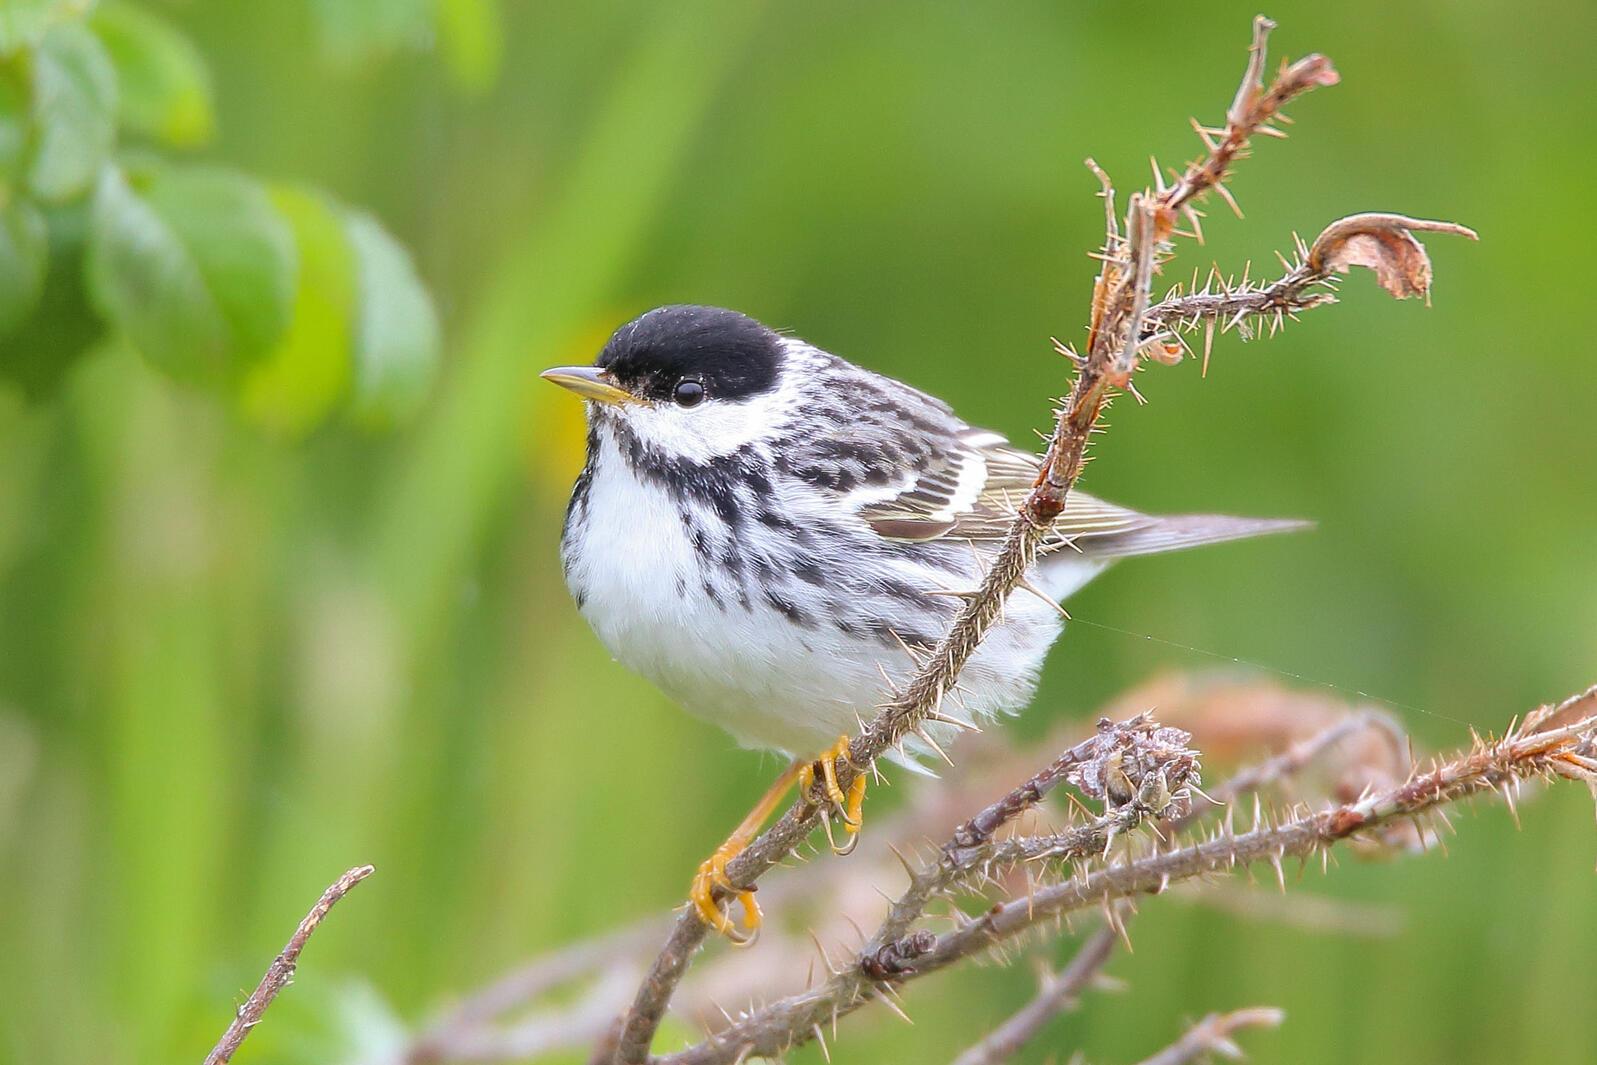 Blackpoll warbler. Scott Heron/Flickr (CC BY SA 2.0)